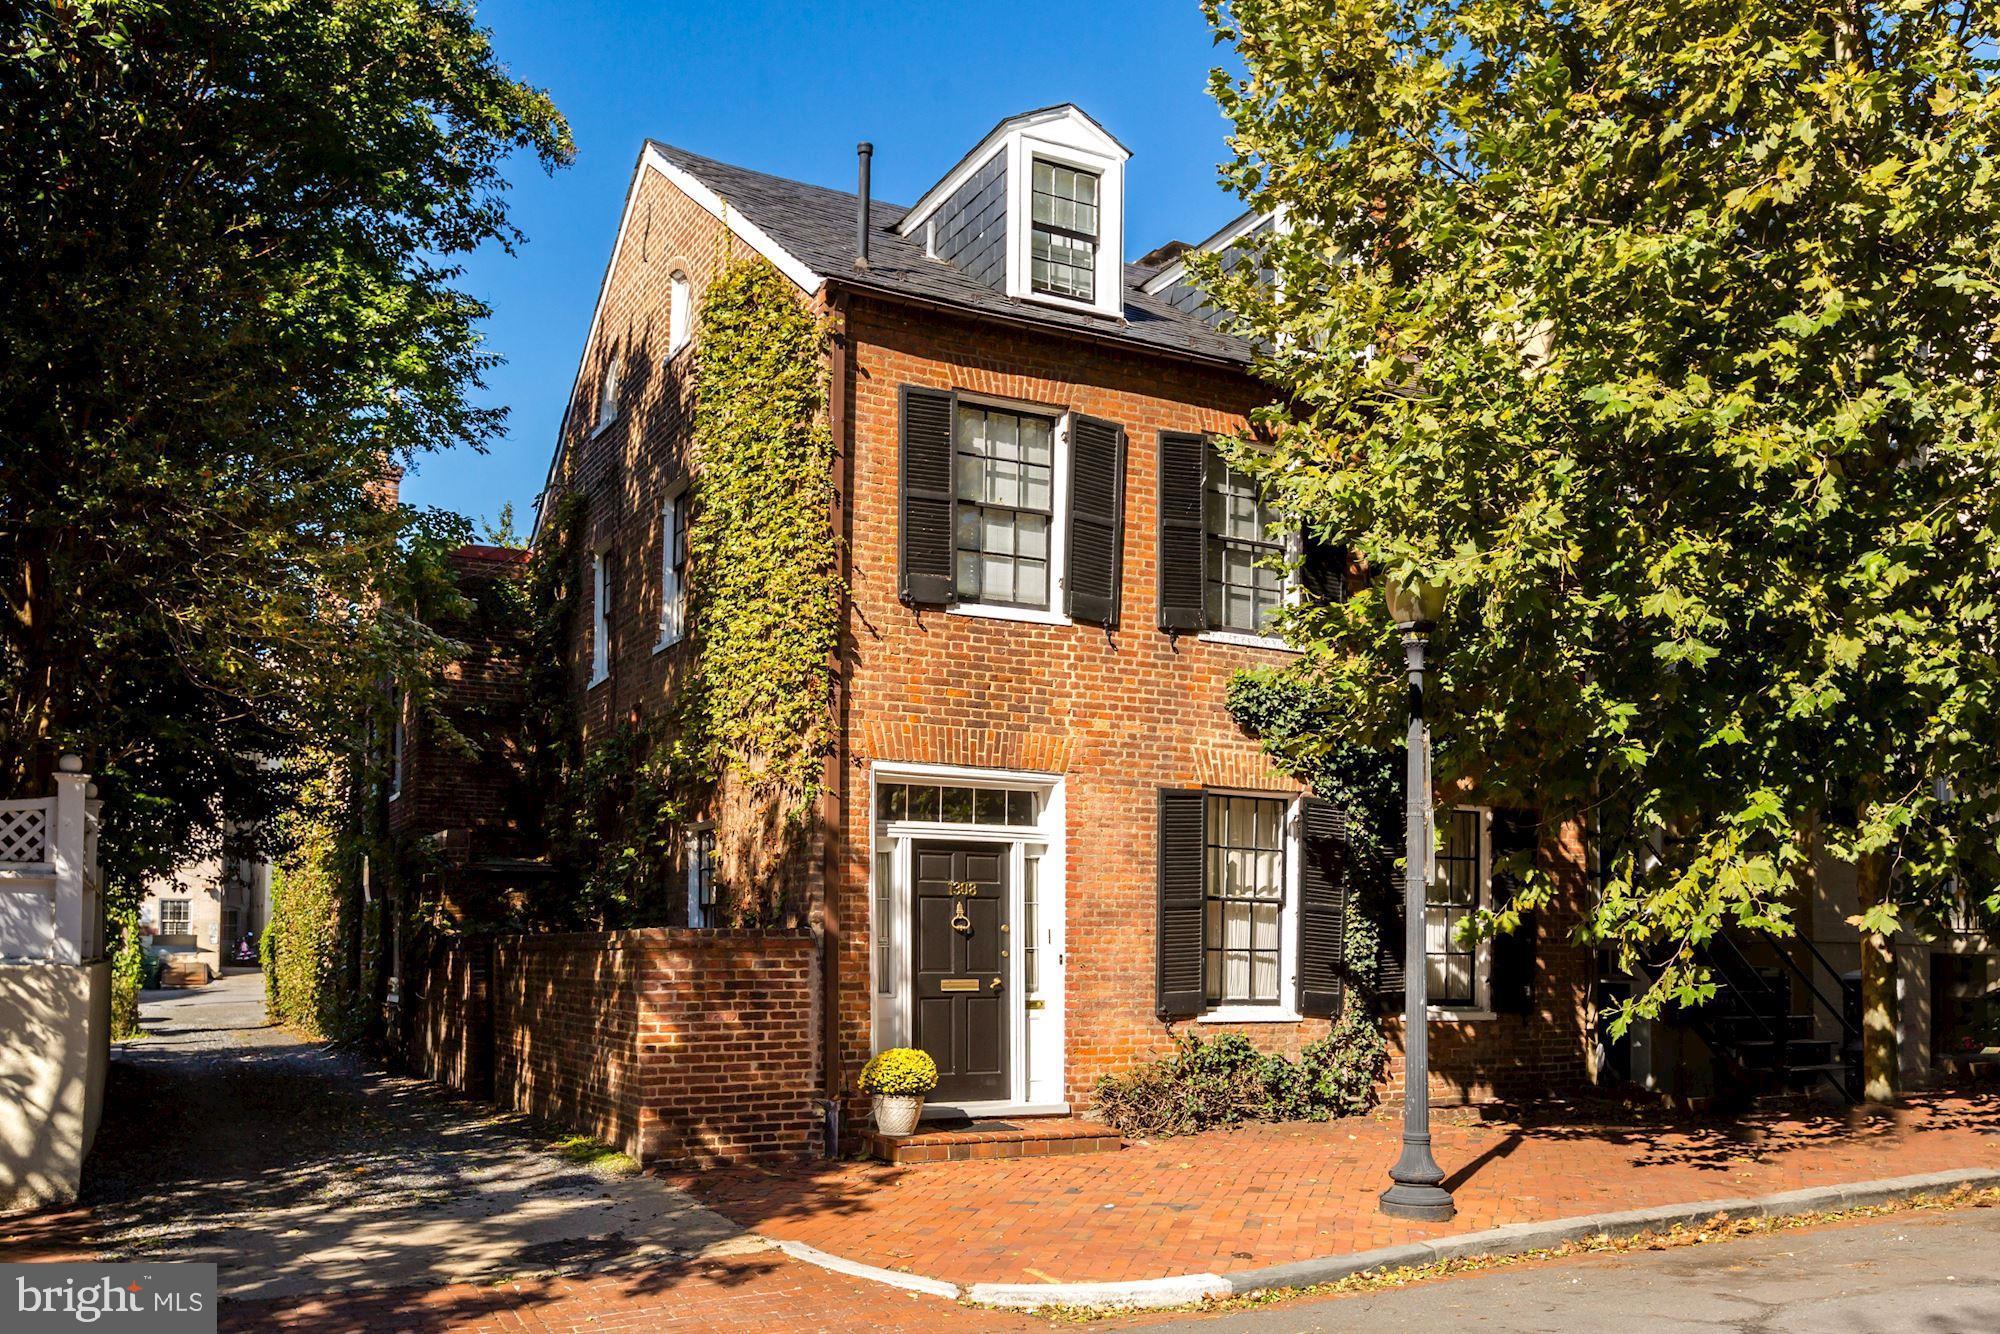 1308 29TH STREET NW, WASHINGTON, DC 20007